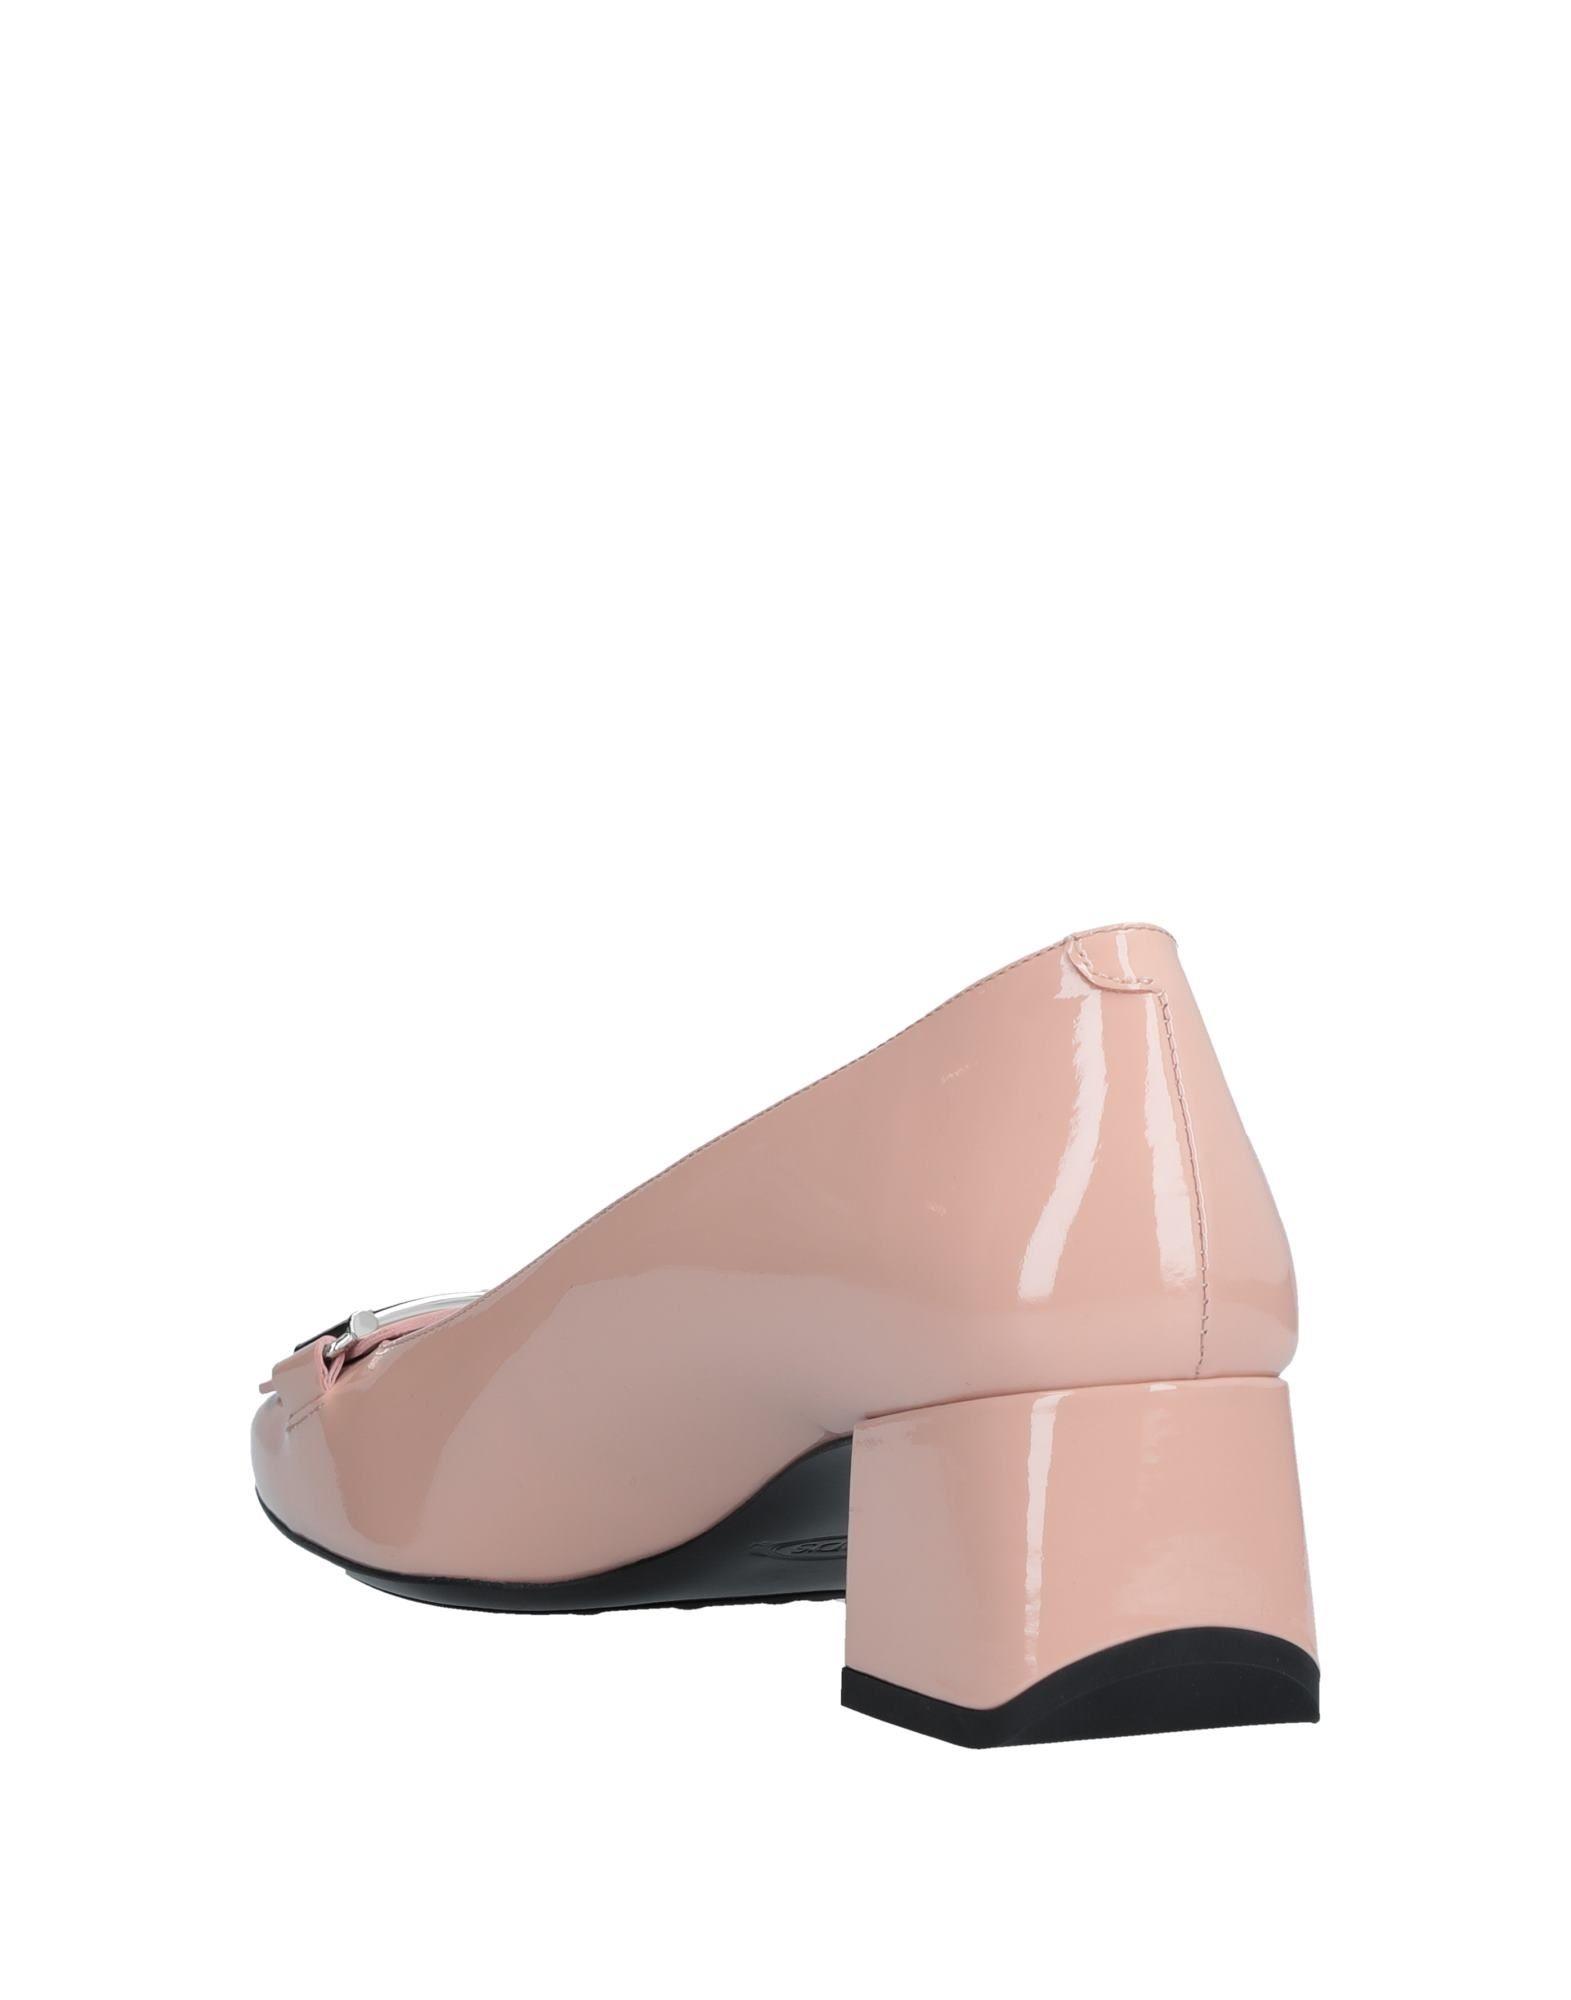 Haltbare Mode billige Schuhe Tod's Mokassins Damen  11541970SX Heiße Schuhe